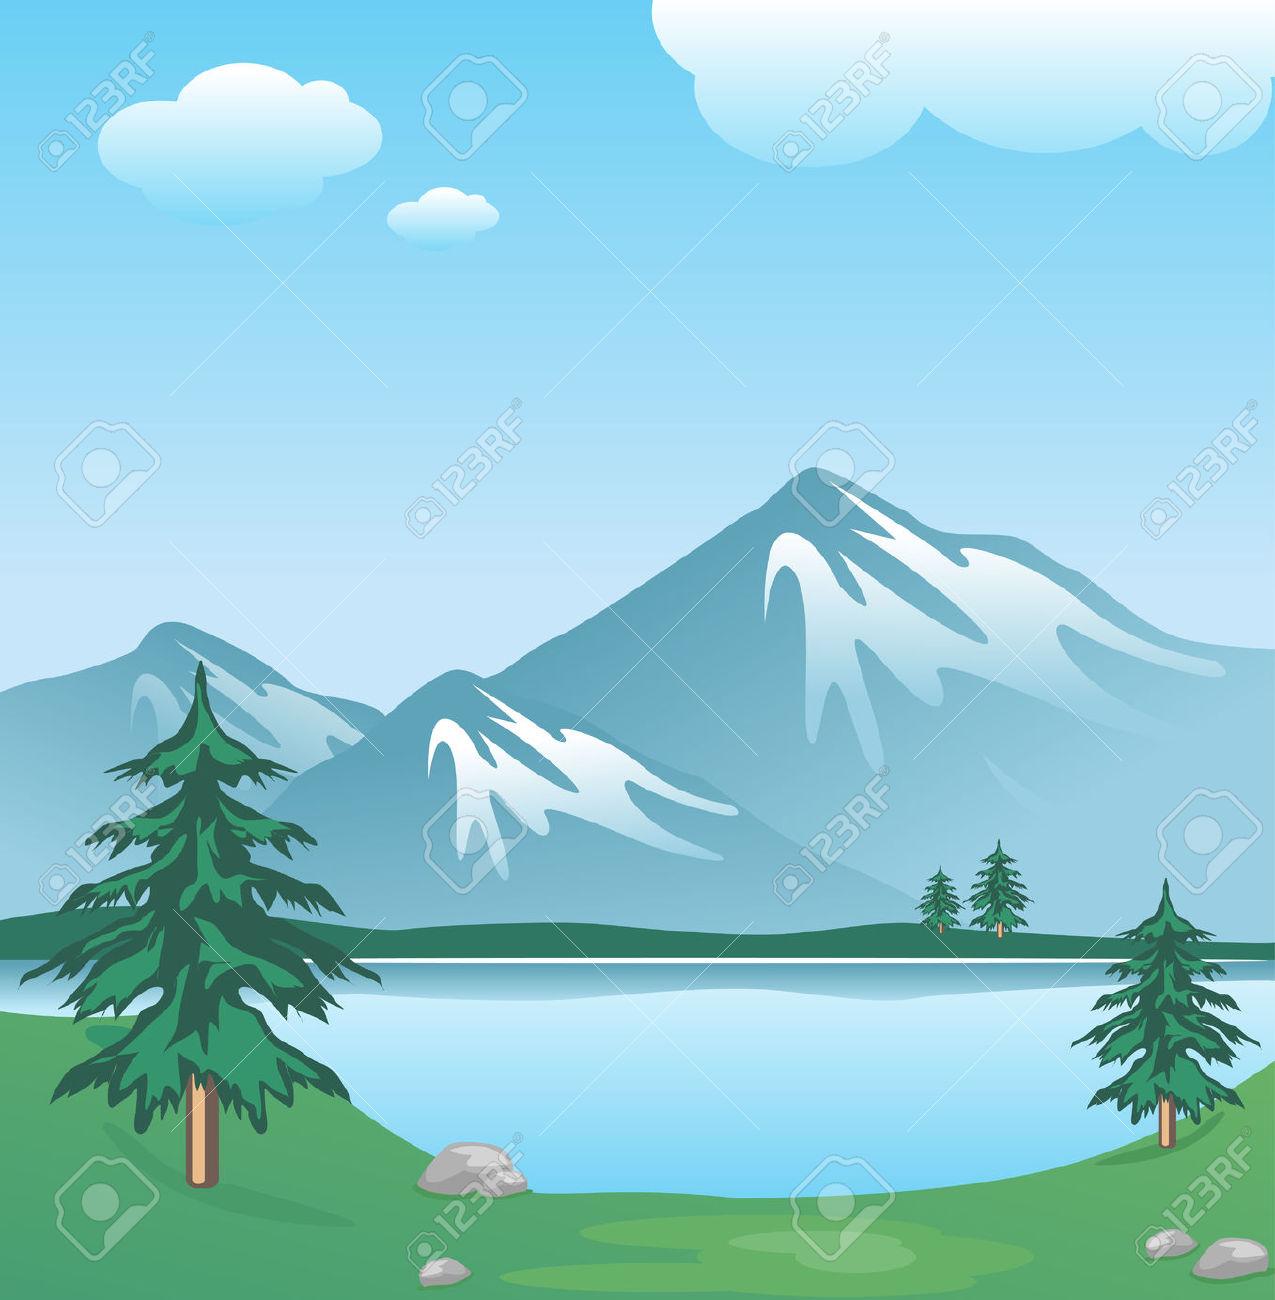 Lake clipart techlodia clipar - Lake Clipart